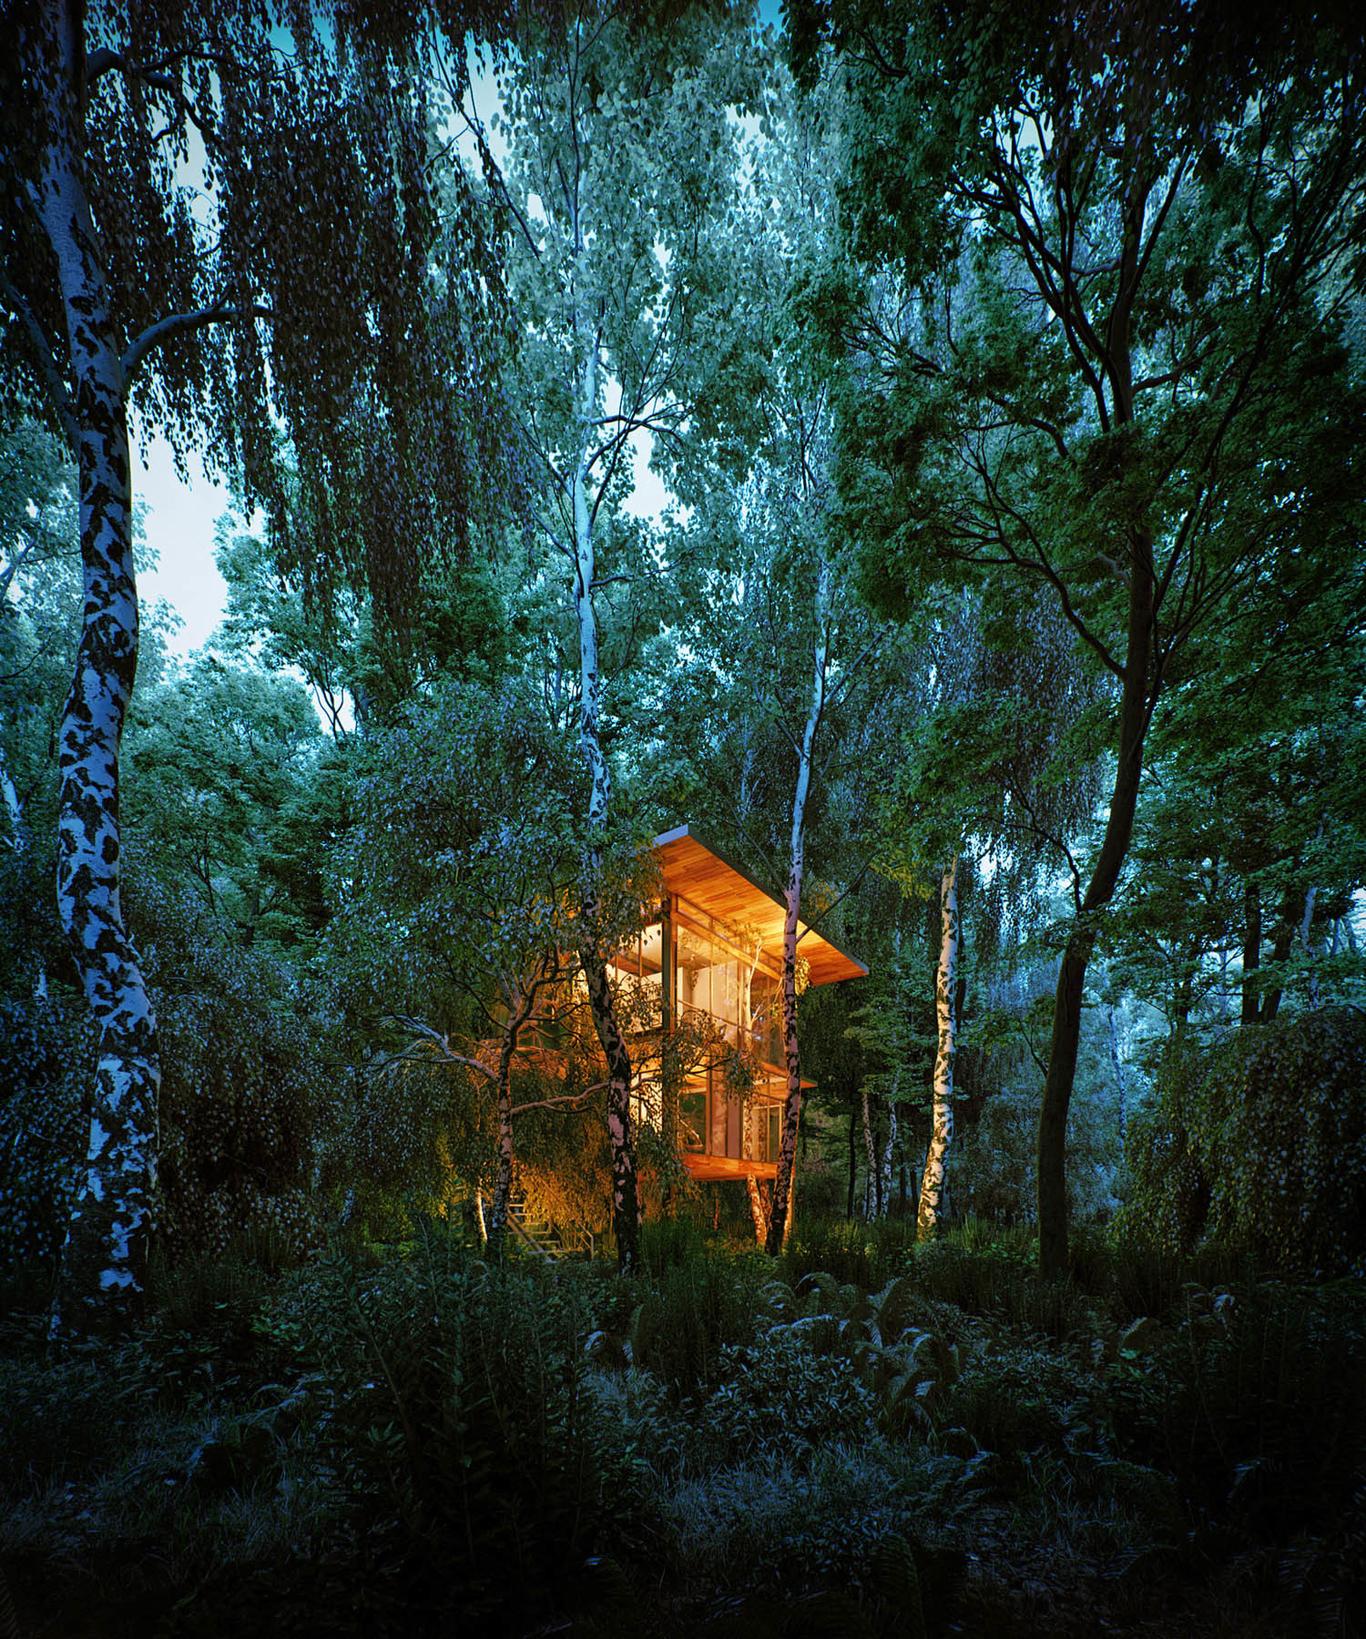 Annkos tiny cabin in the wo 1 b29d323d xiz5